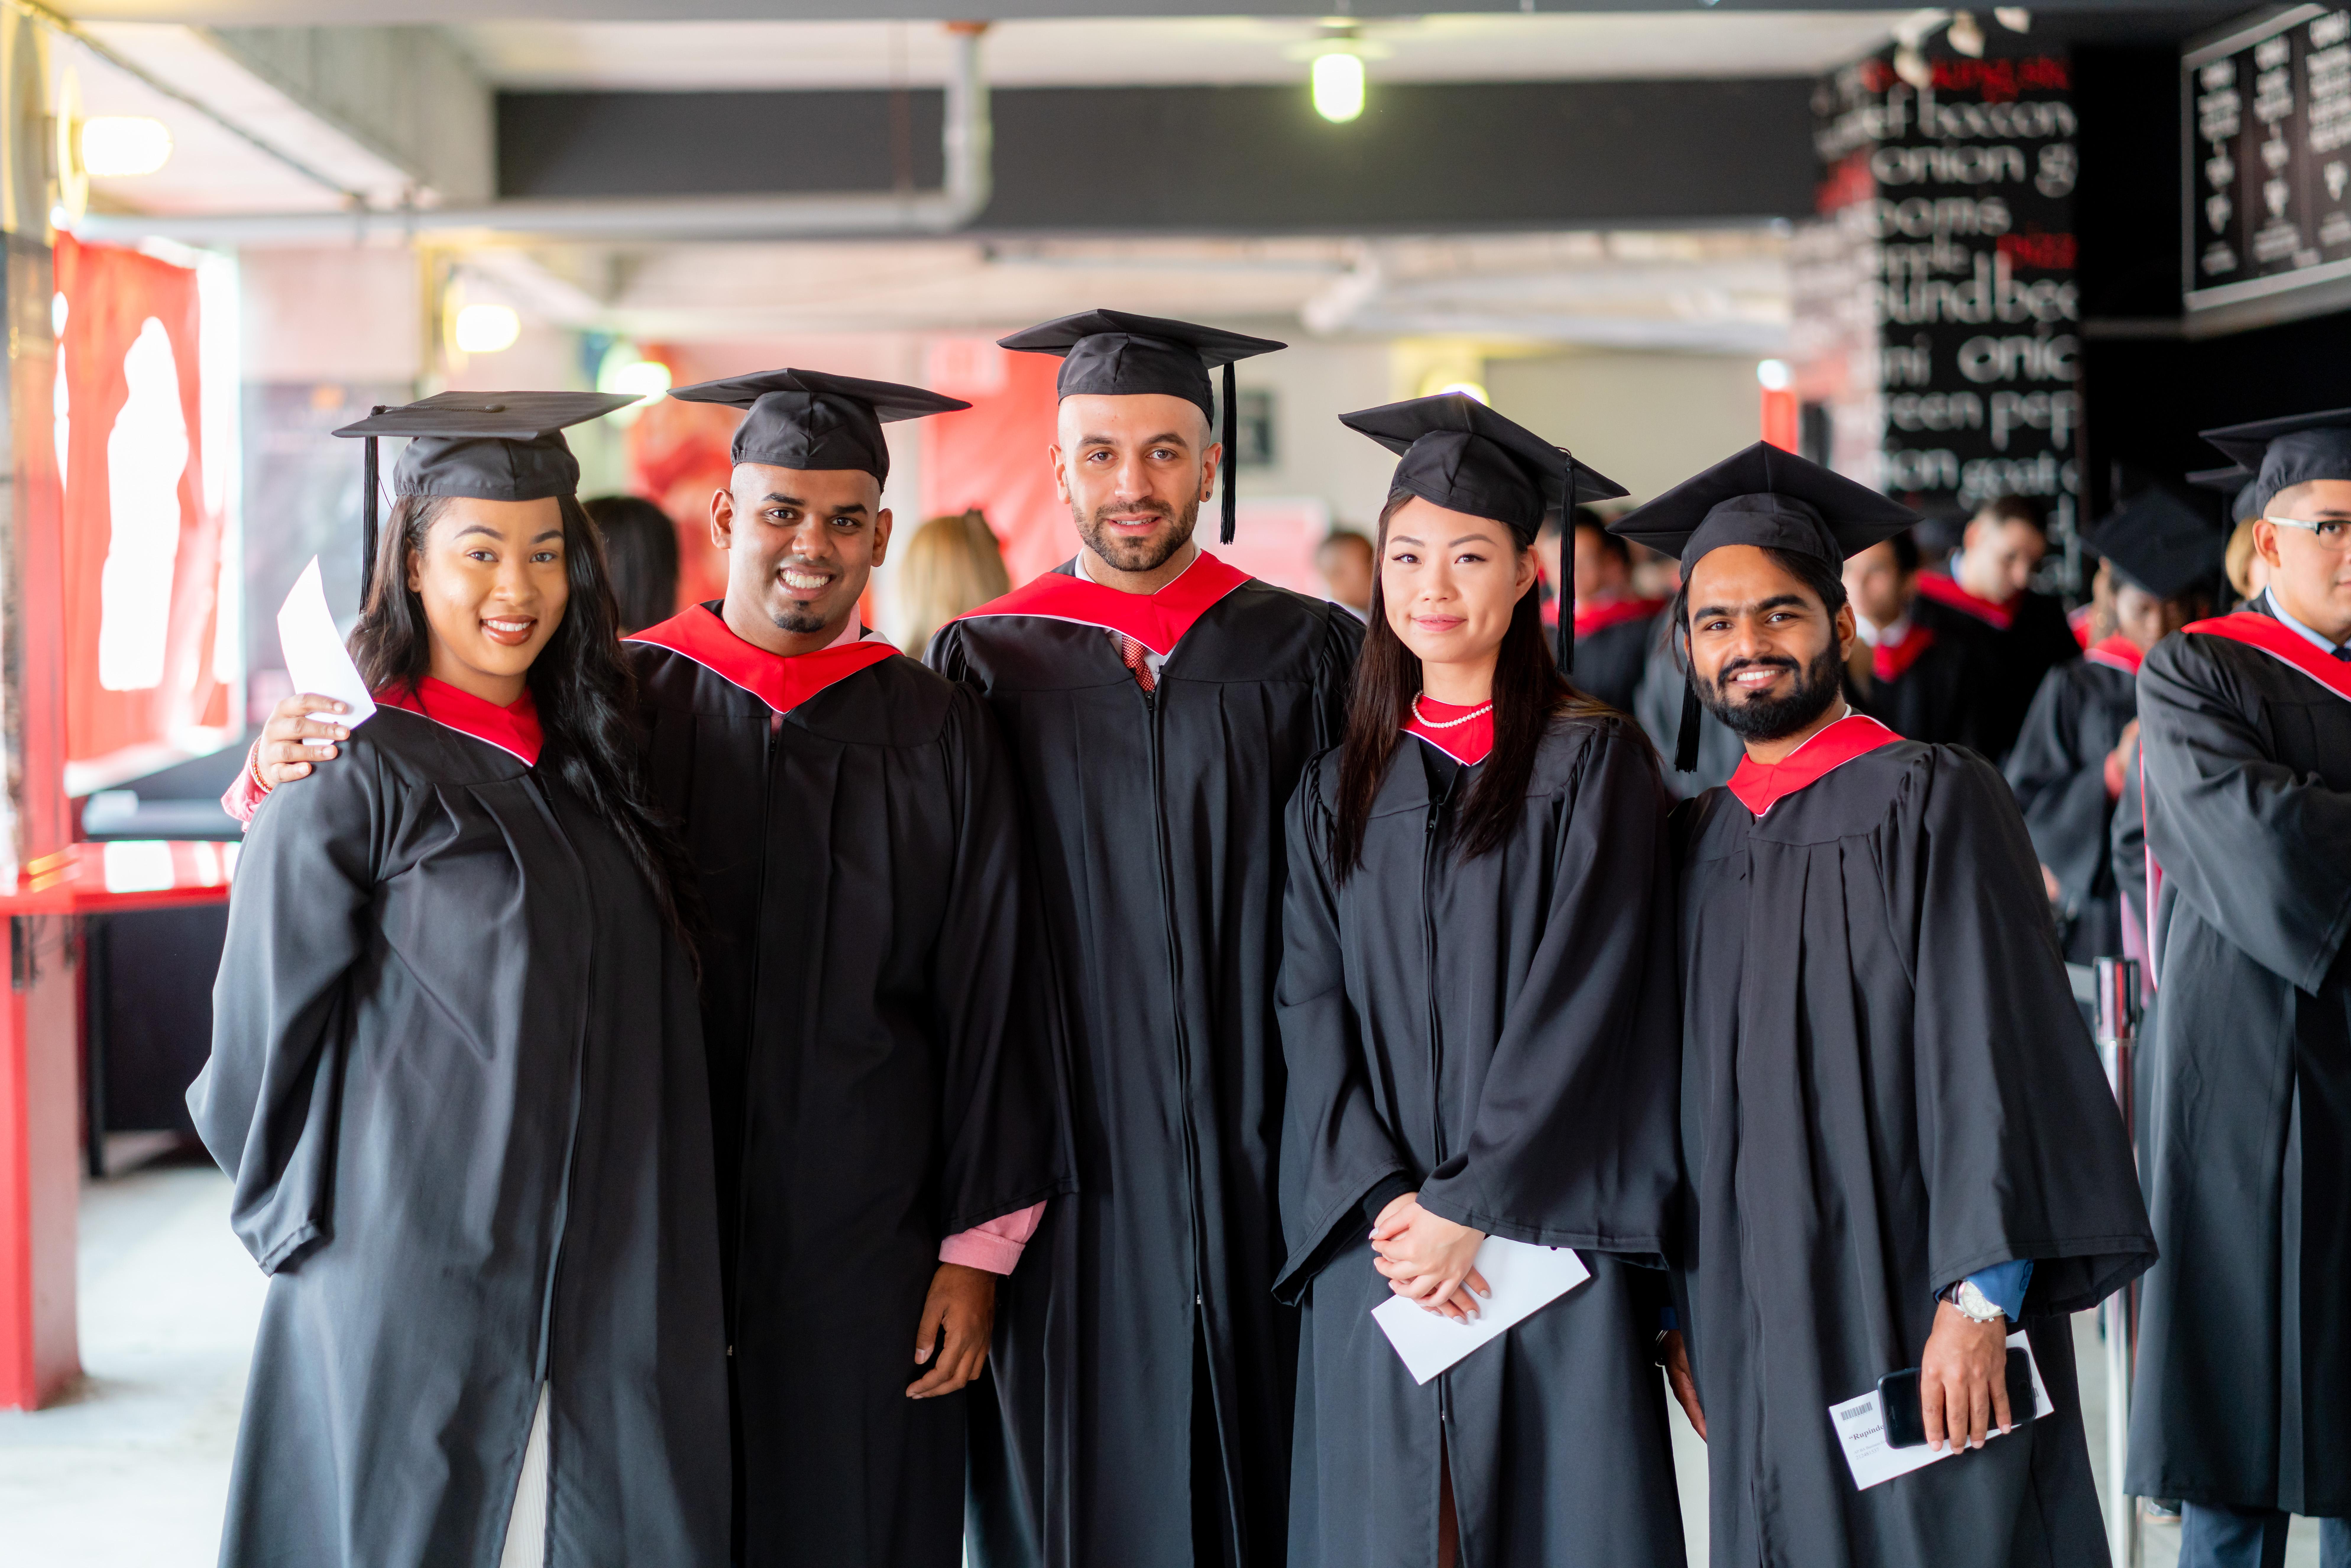 A group of York graduates